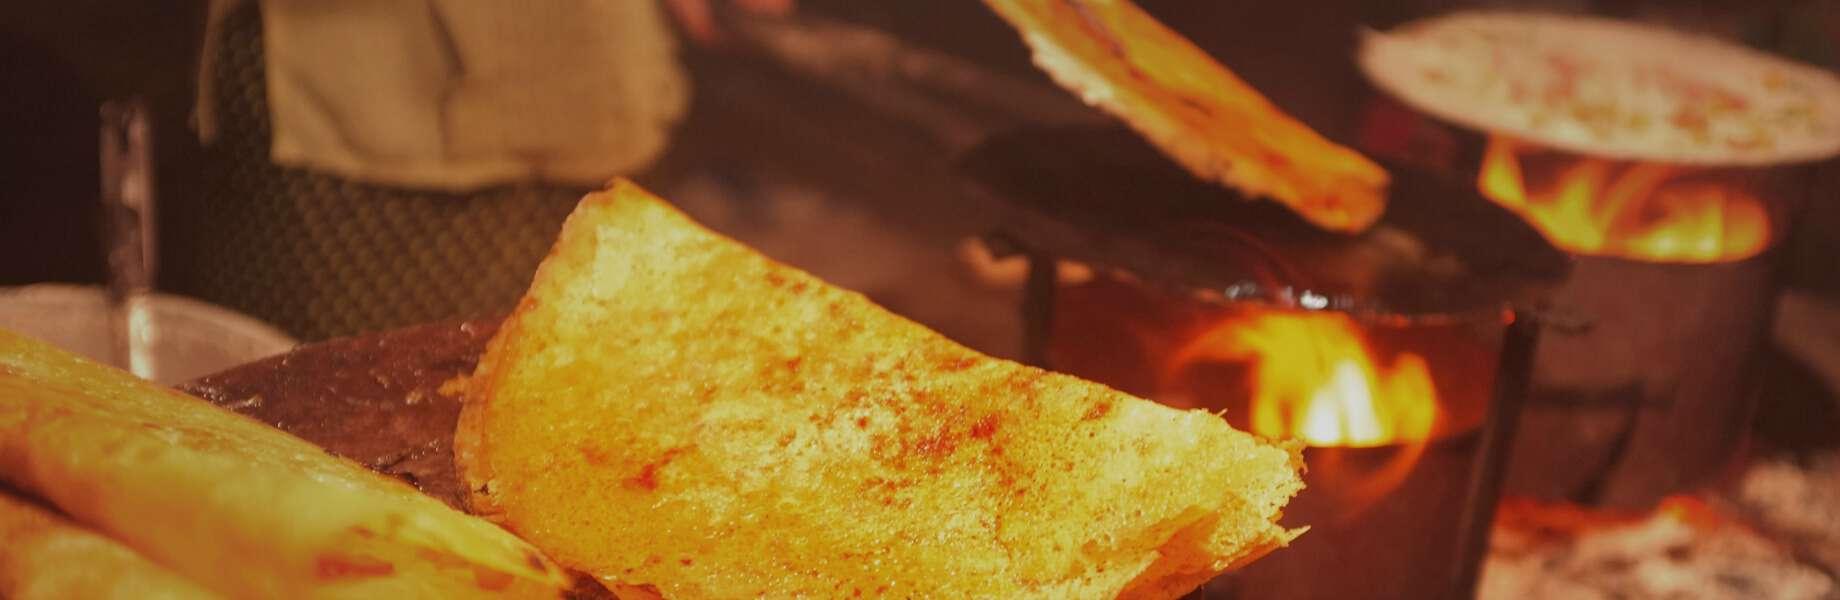 Myanmar Family Adventure - Pancake Street Food